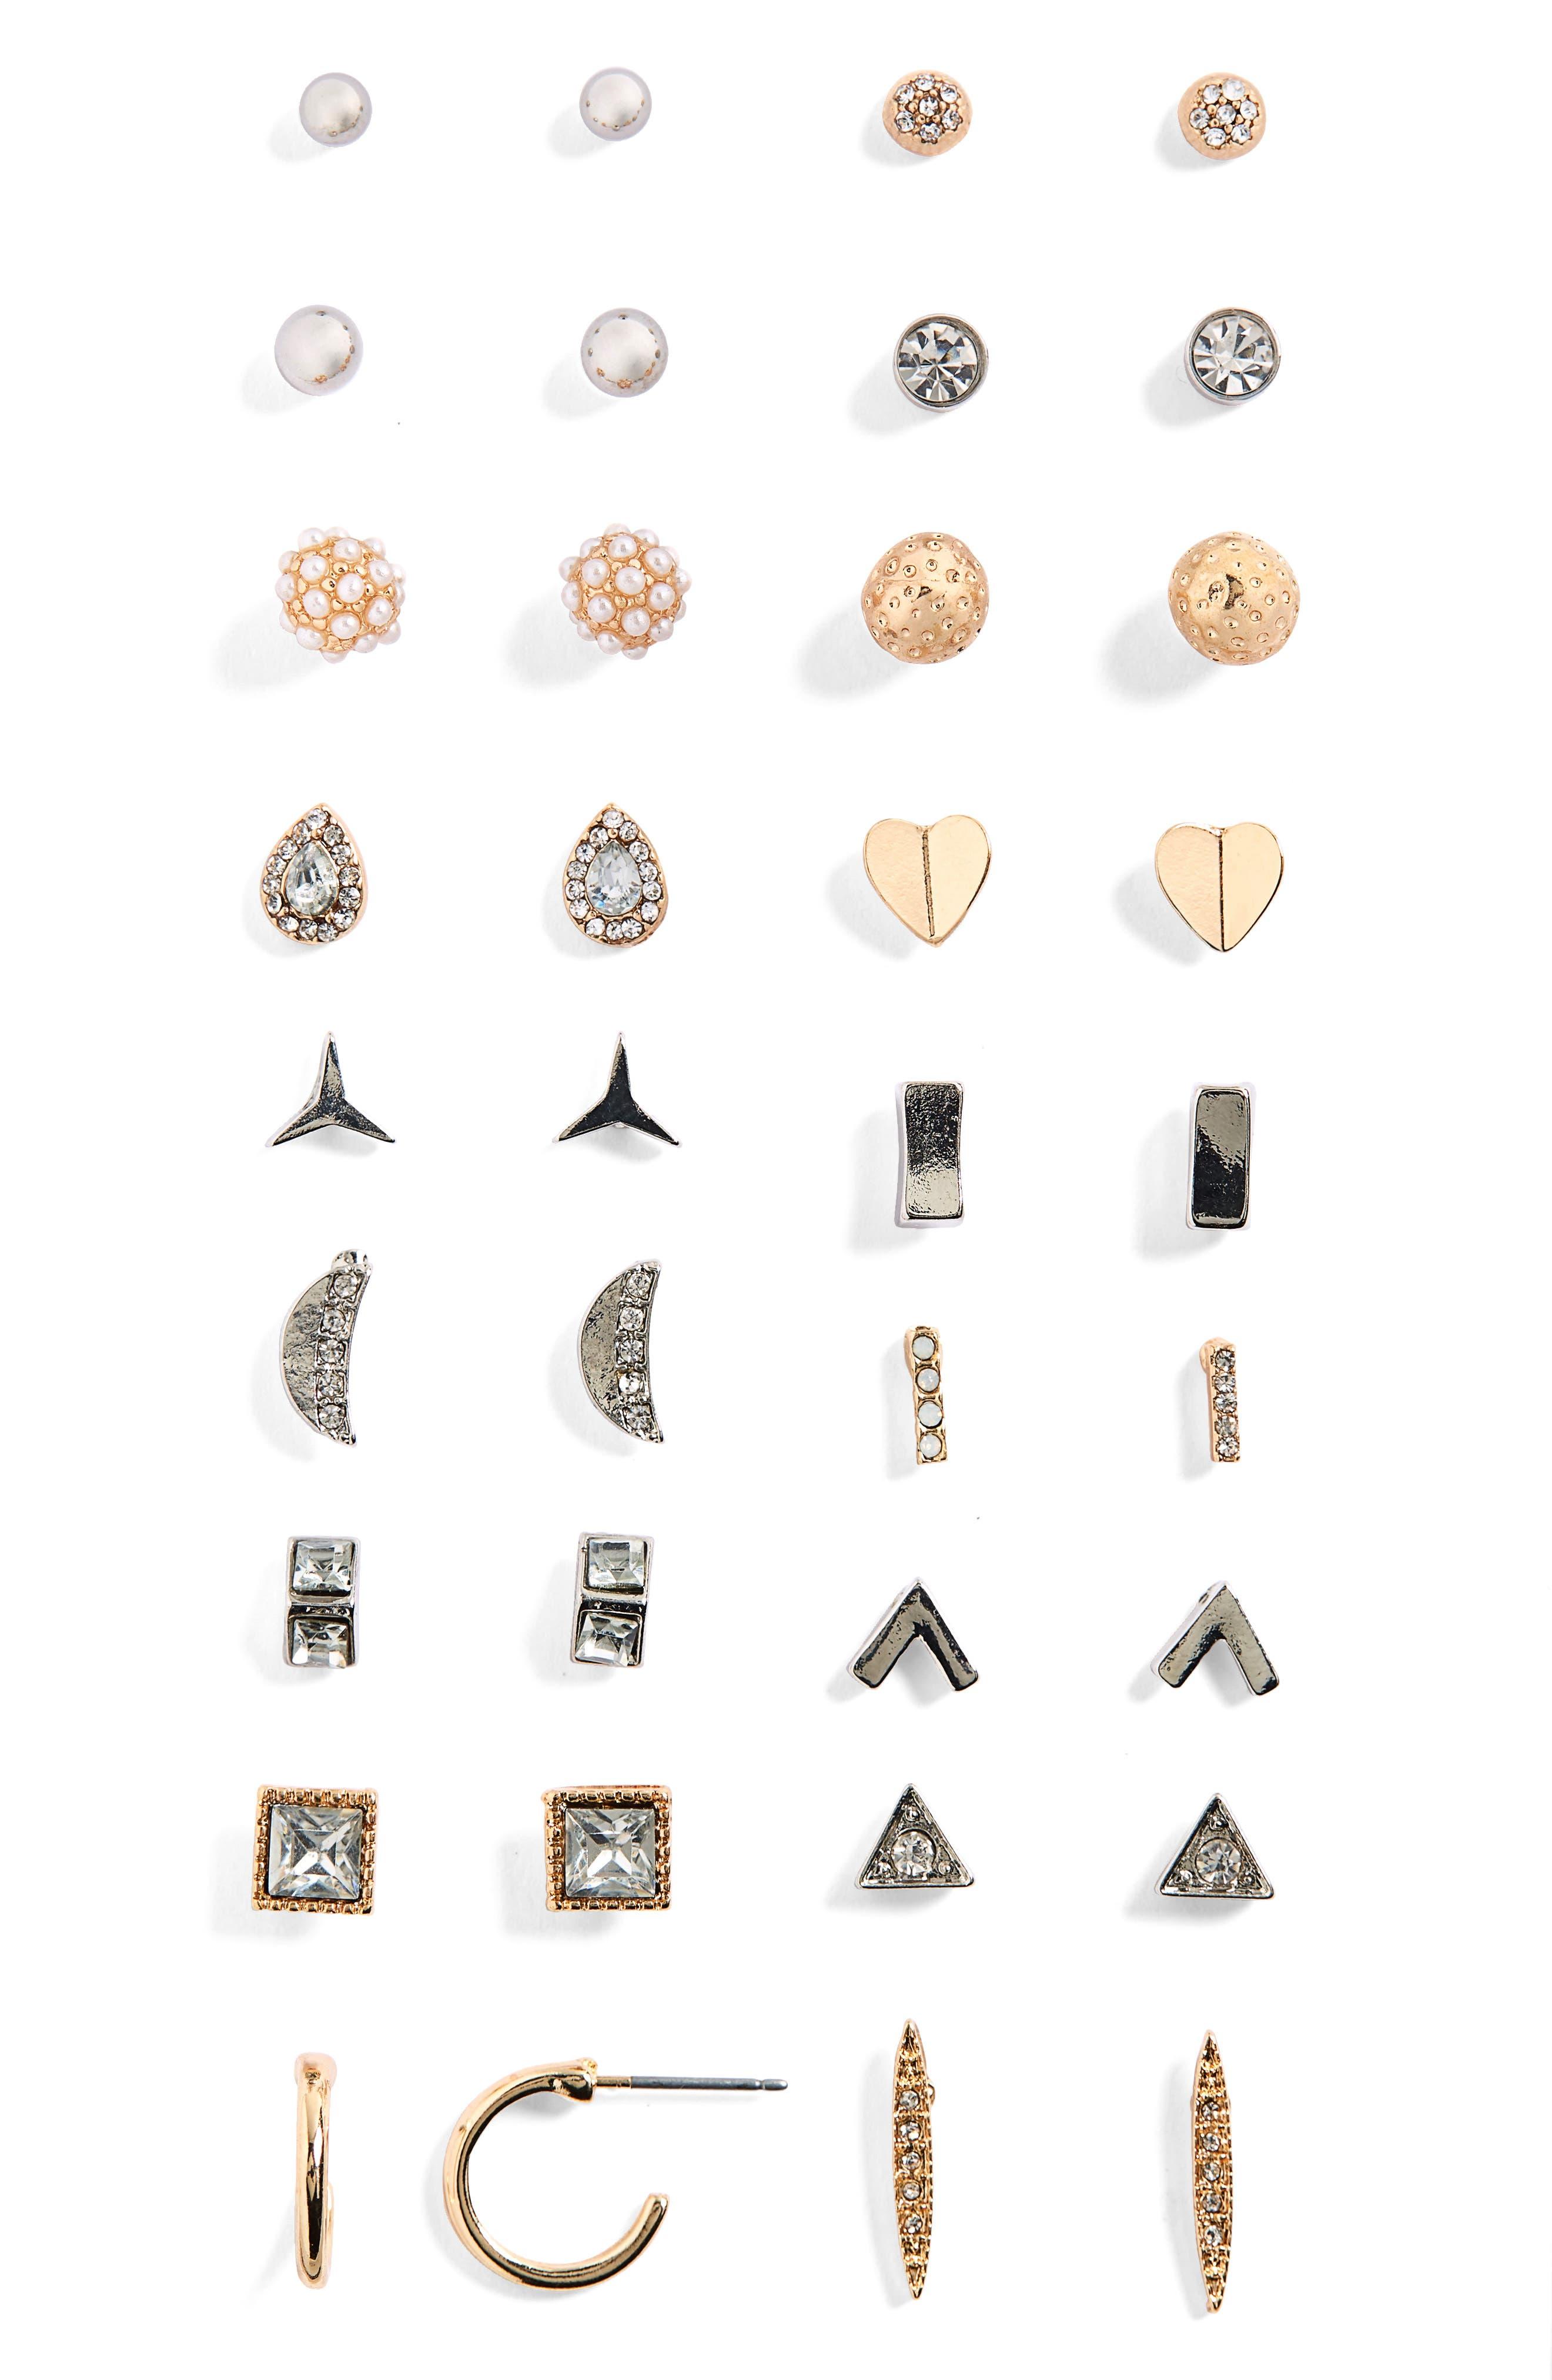 18-Pack Imitation Pearl & Crystal Stud Earrings,                         Main,                         color, 710